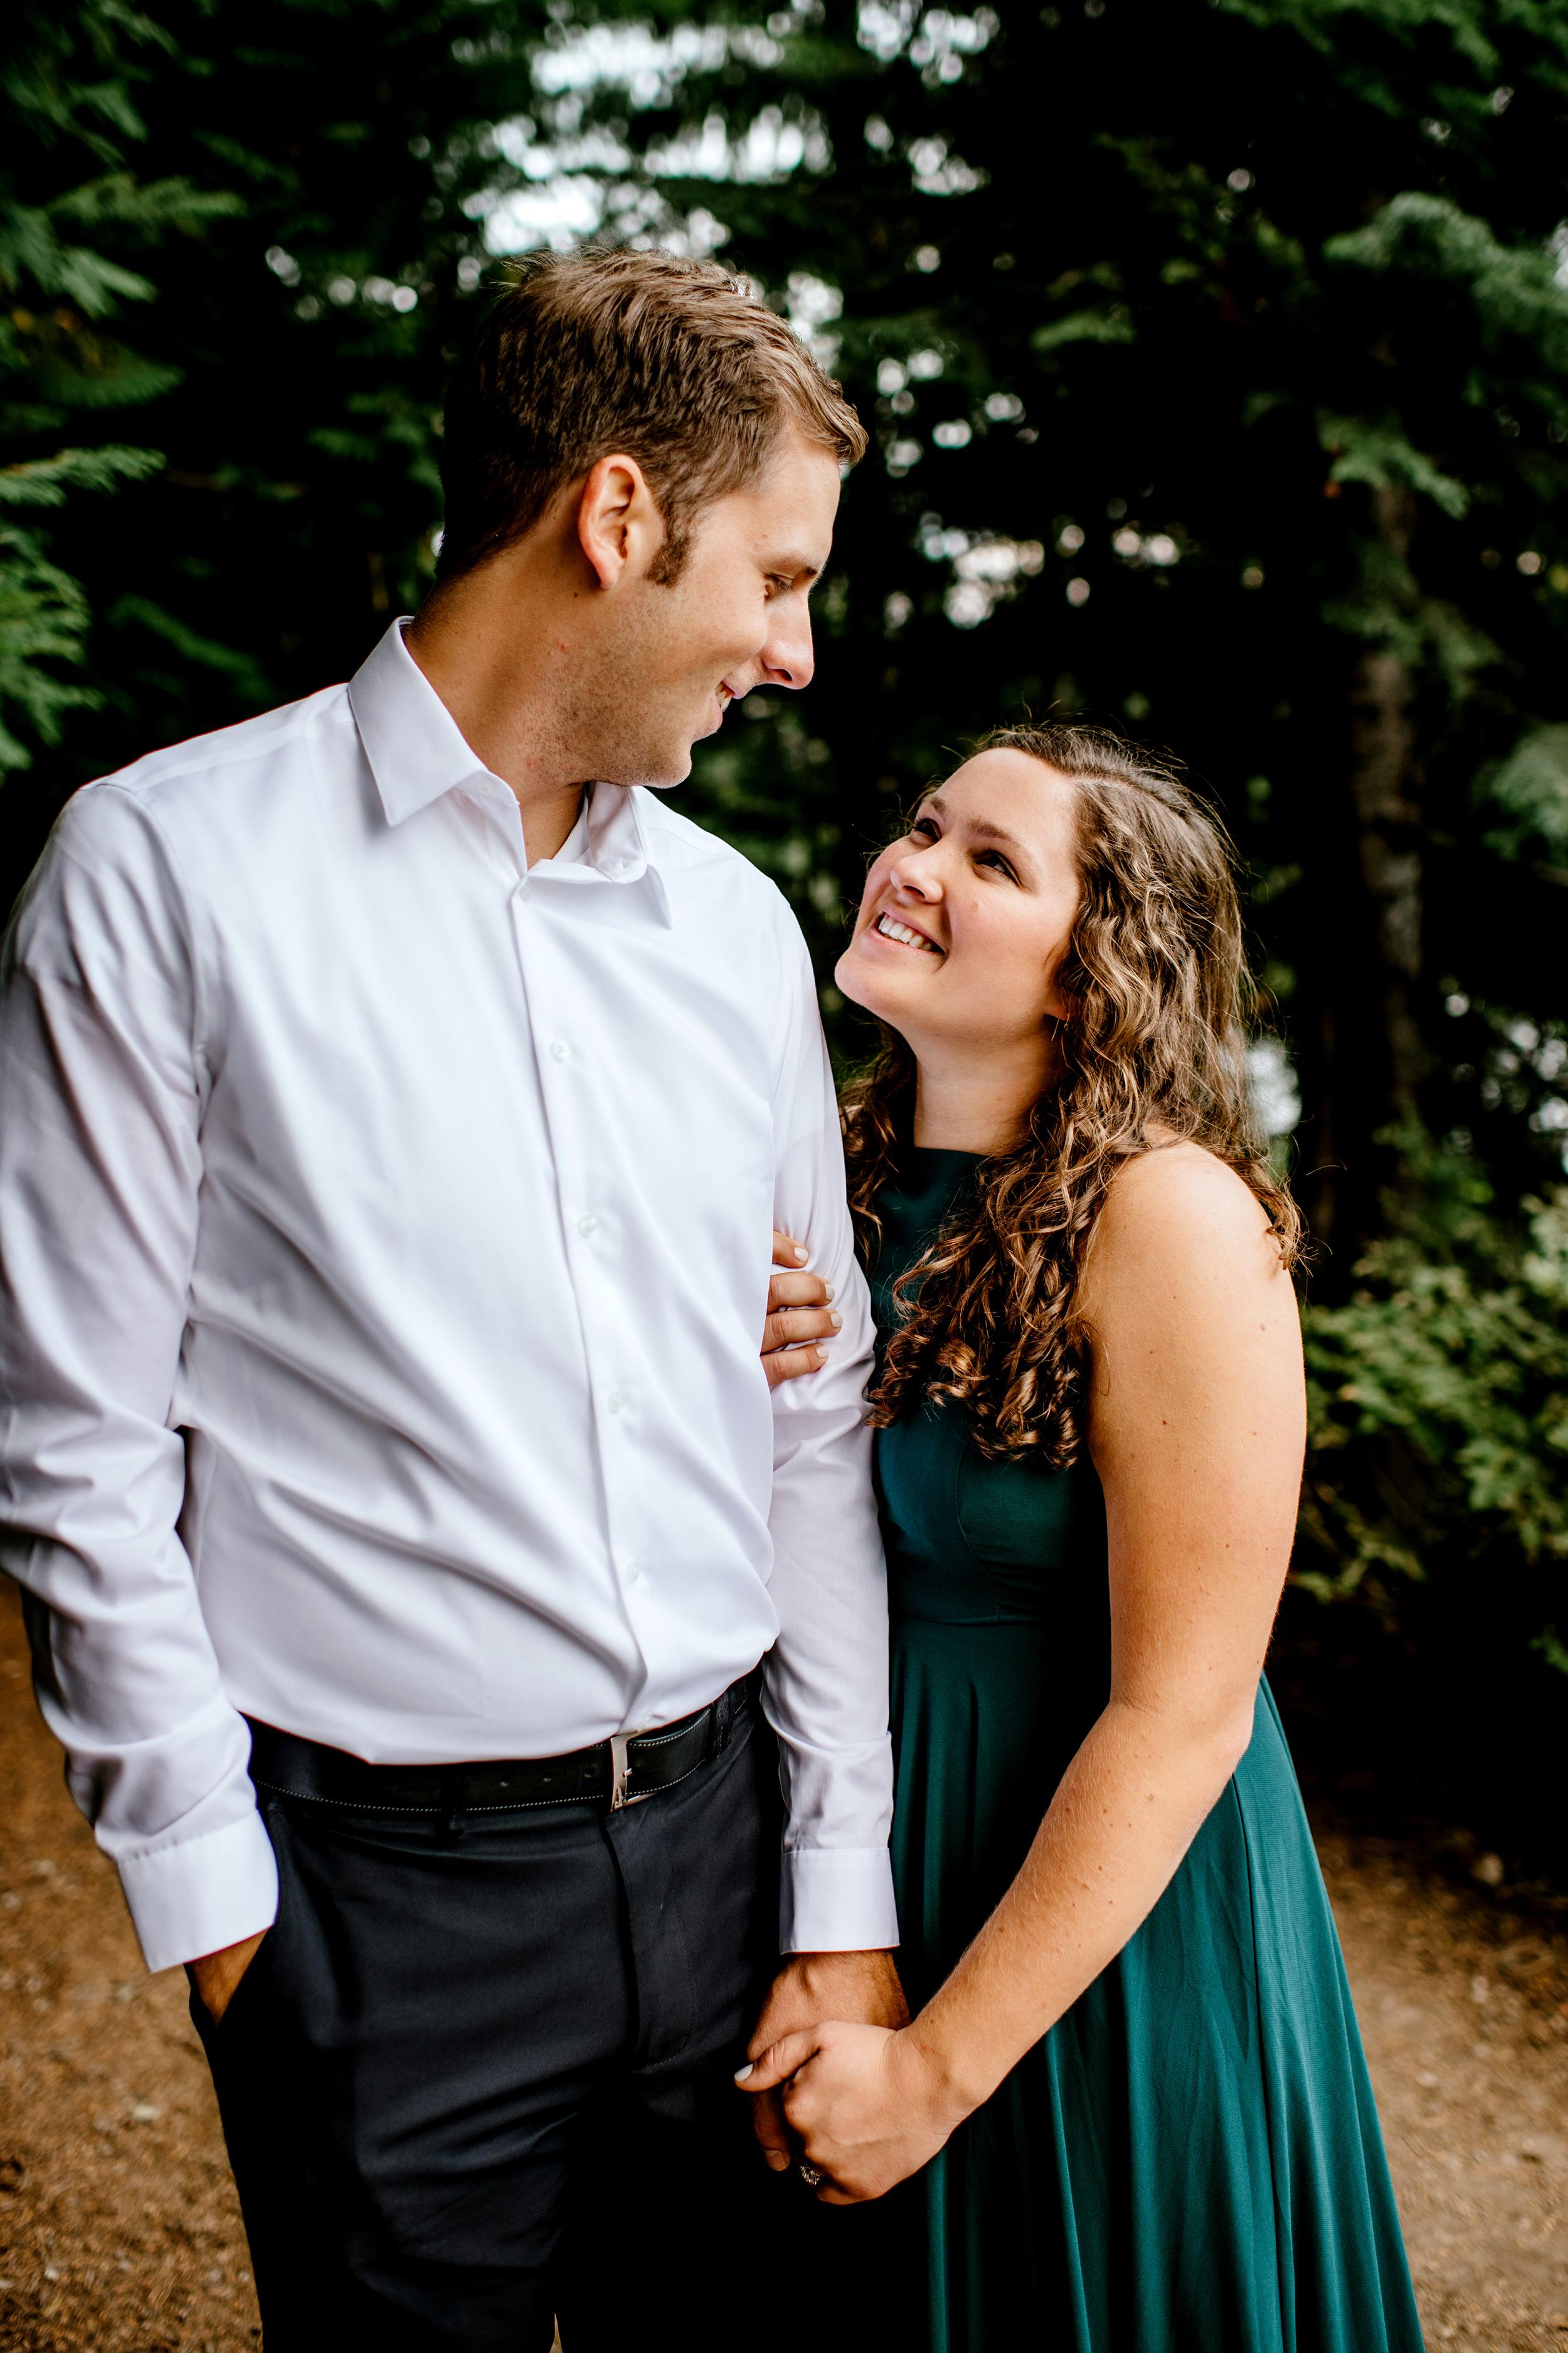 Trillium-lake-Engagement-Photos-Portland-wedding-photography120.jpg